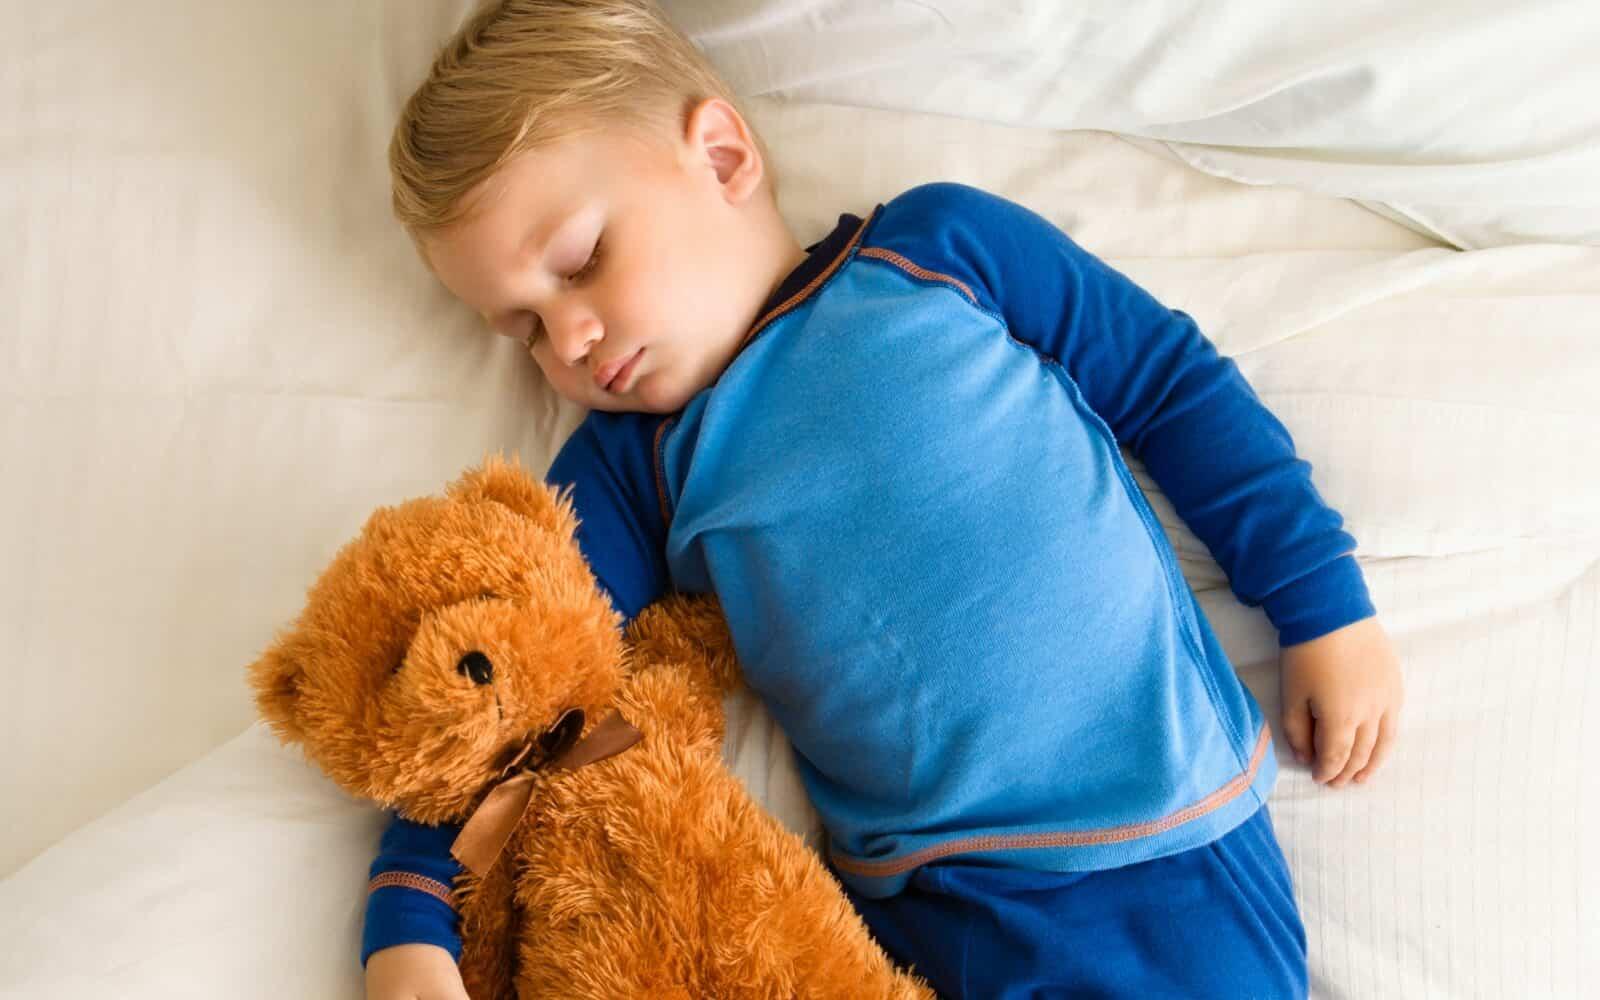 Toddler boy sleeps next to teddy bear.